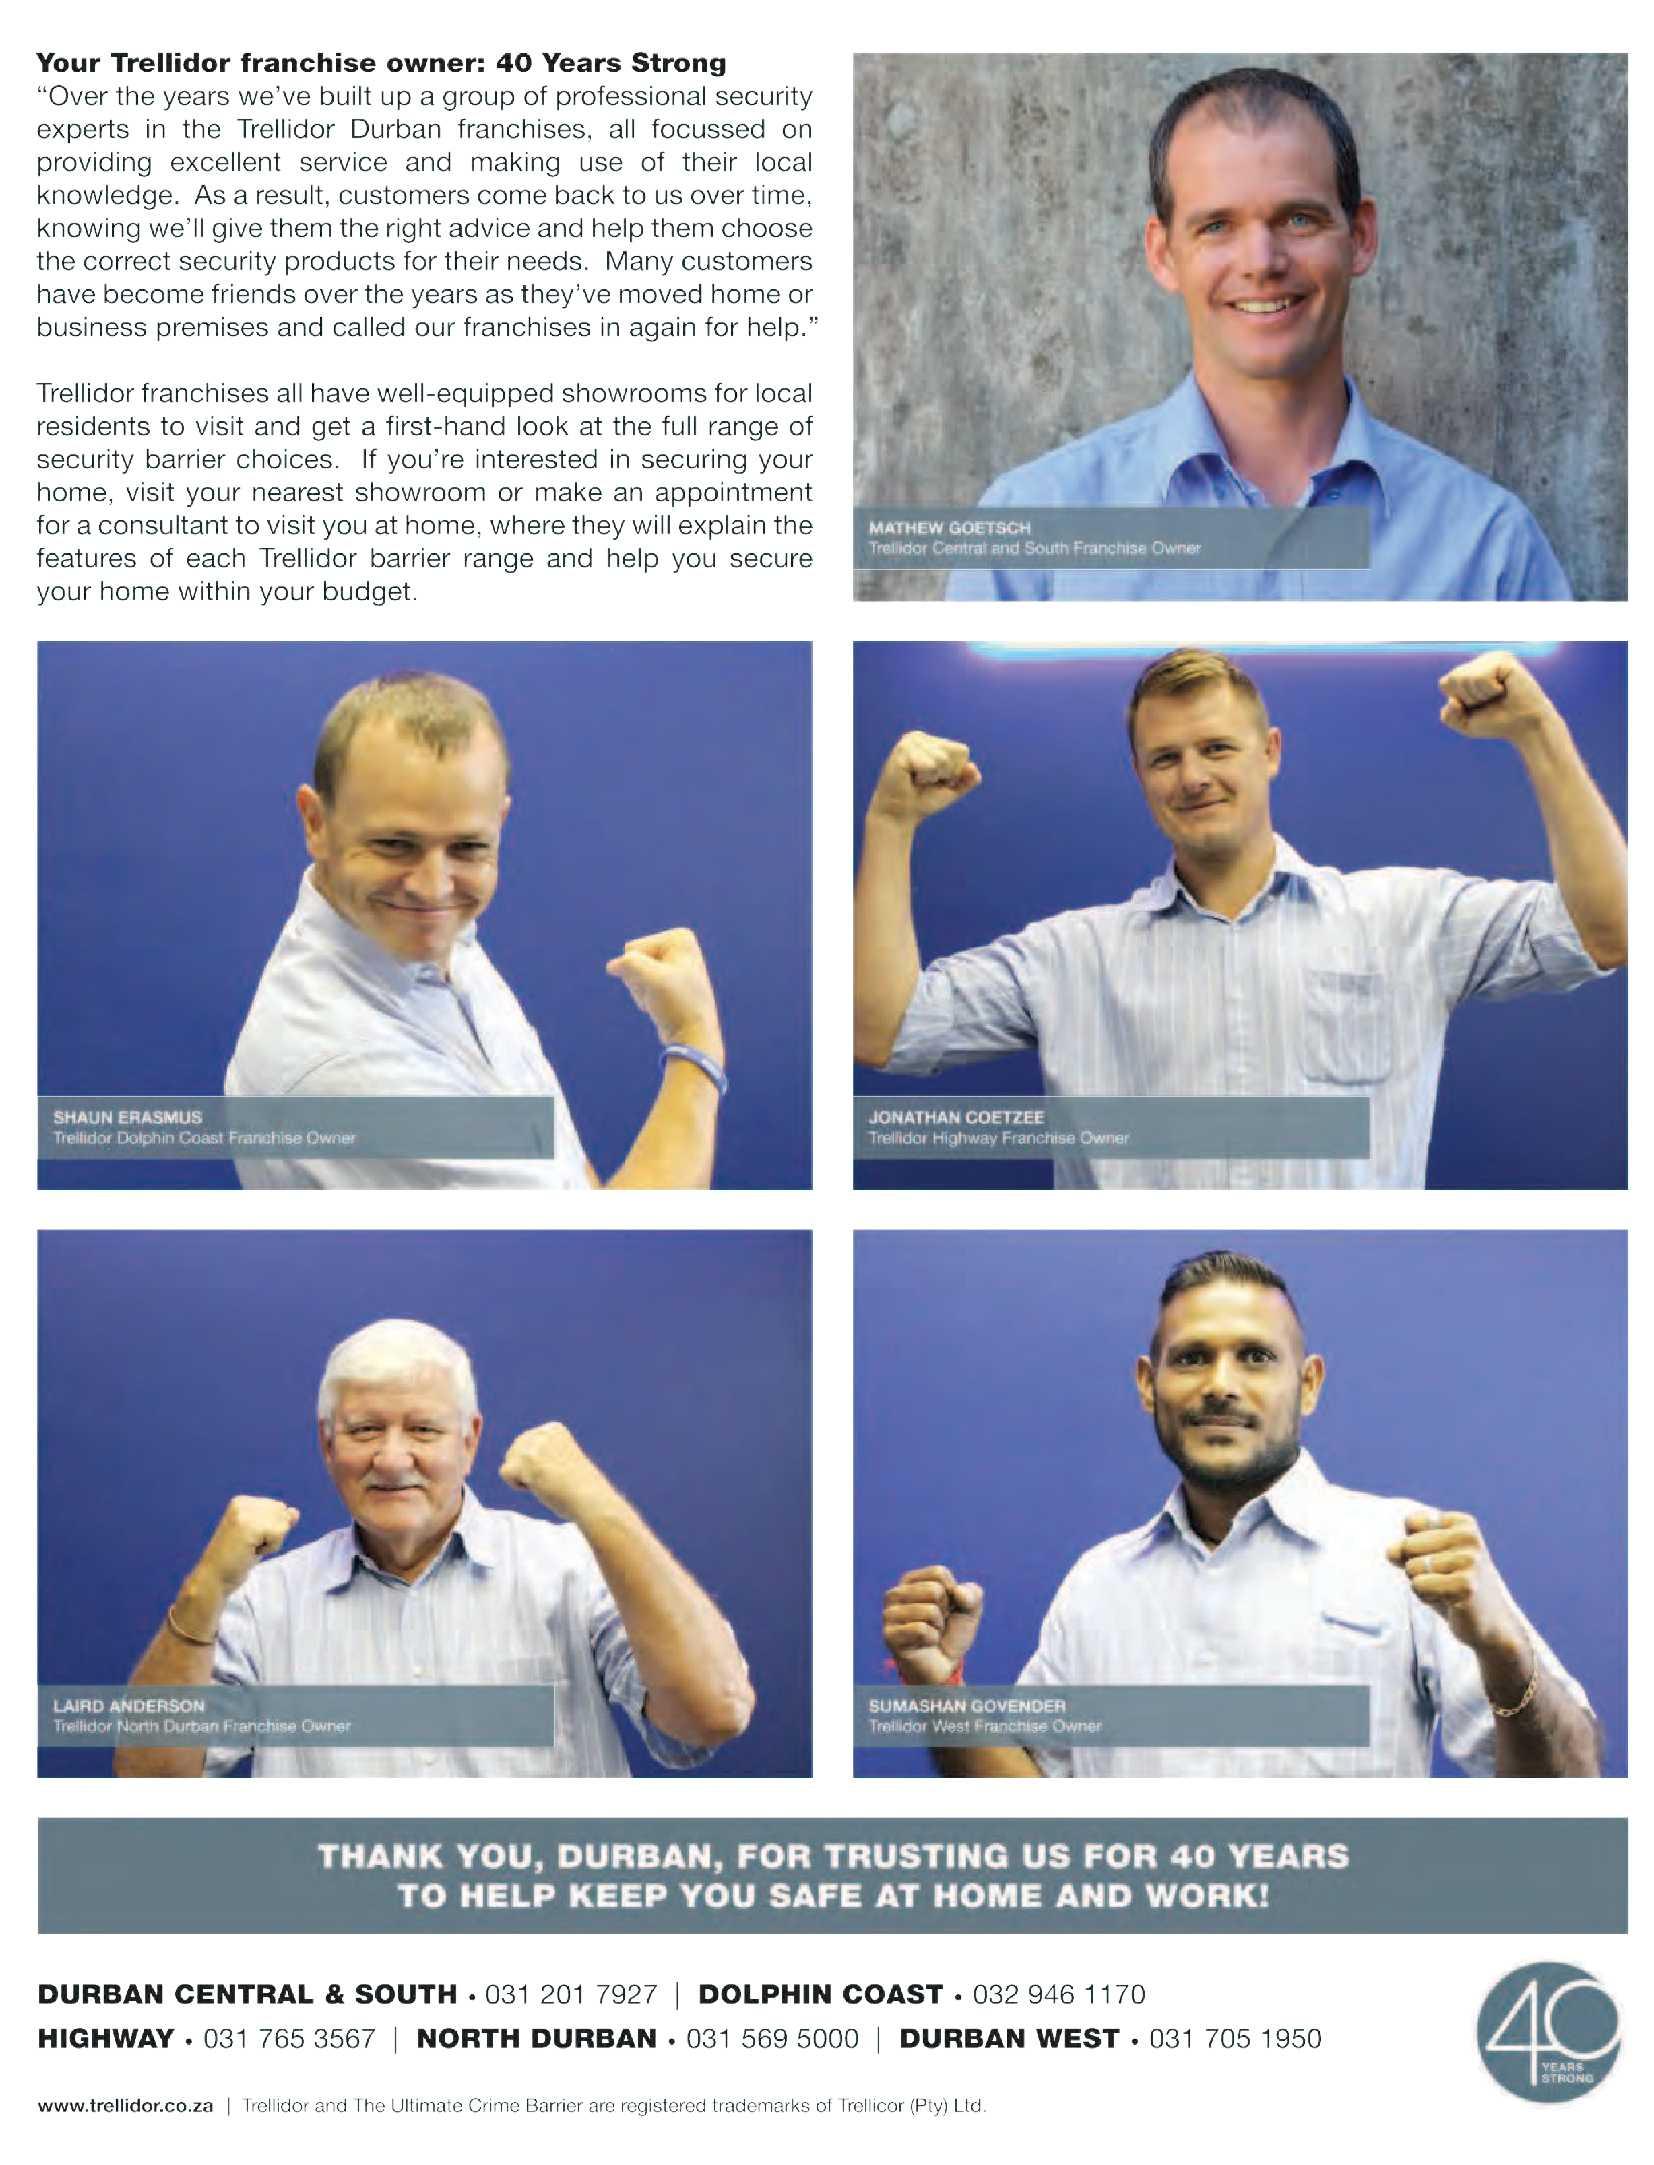 get-magazine-ballitoumhlanga-may-2017-epapers-page-29